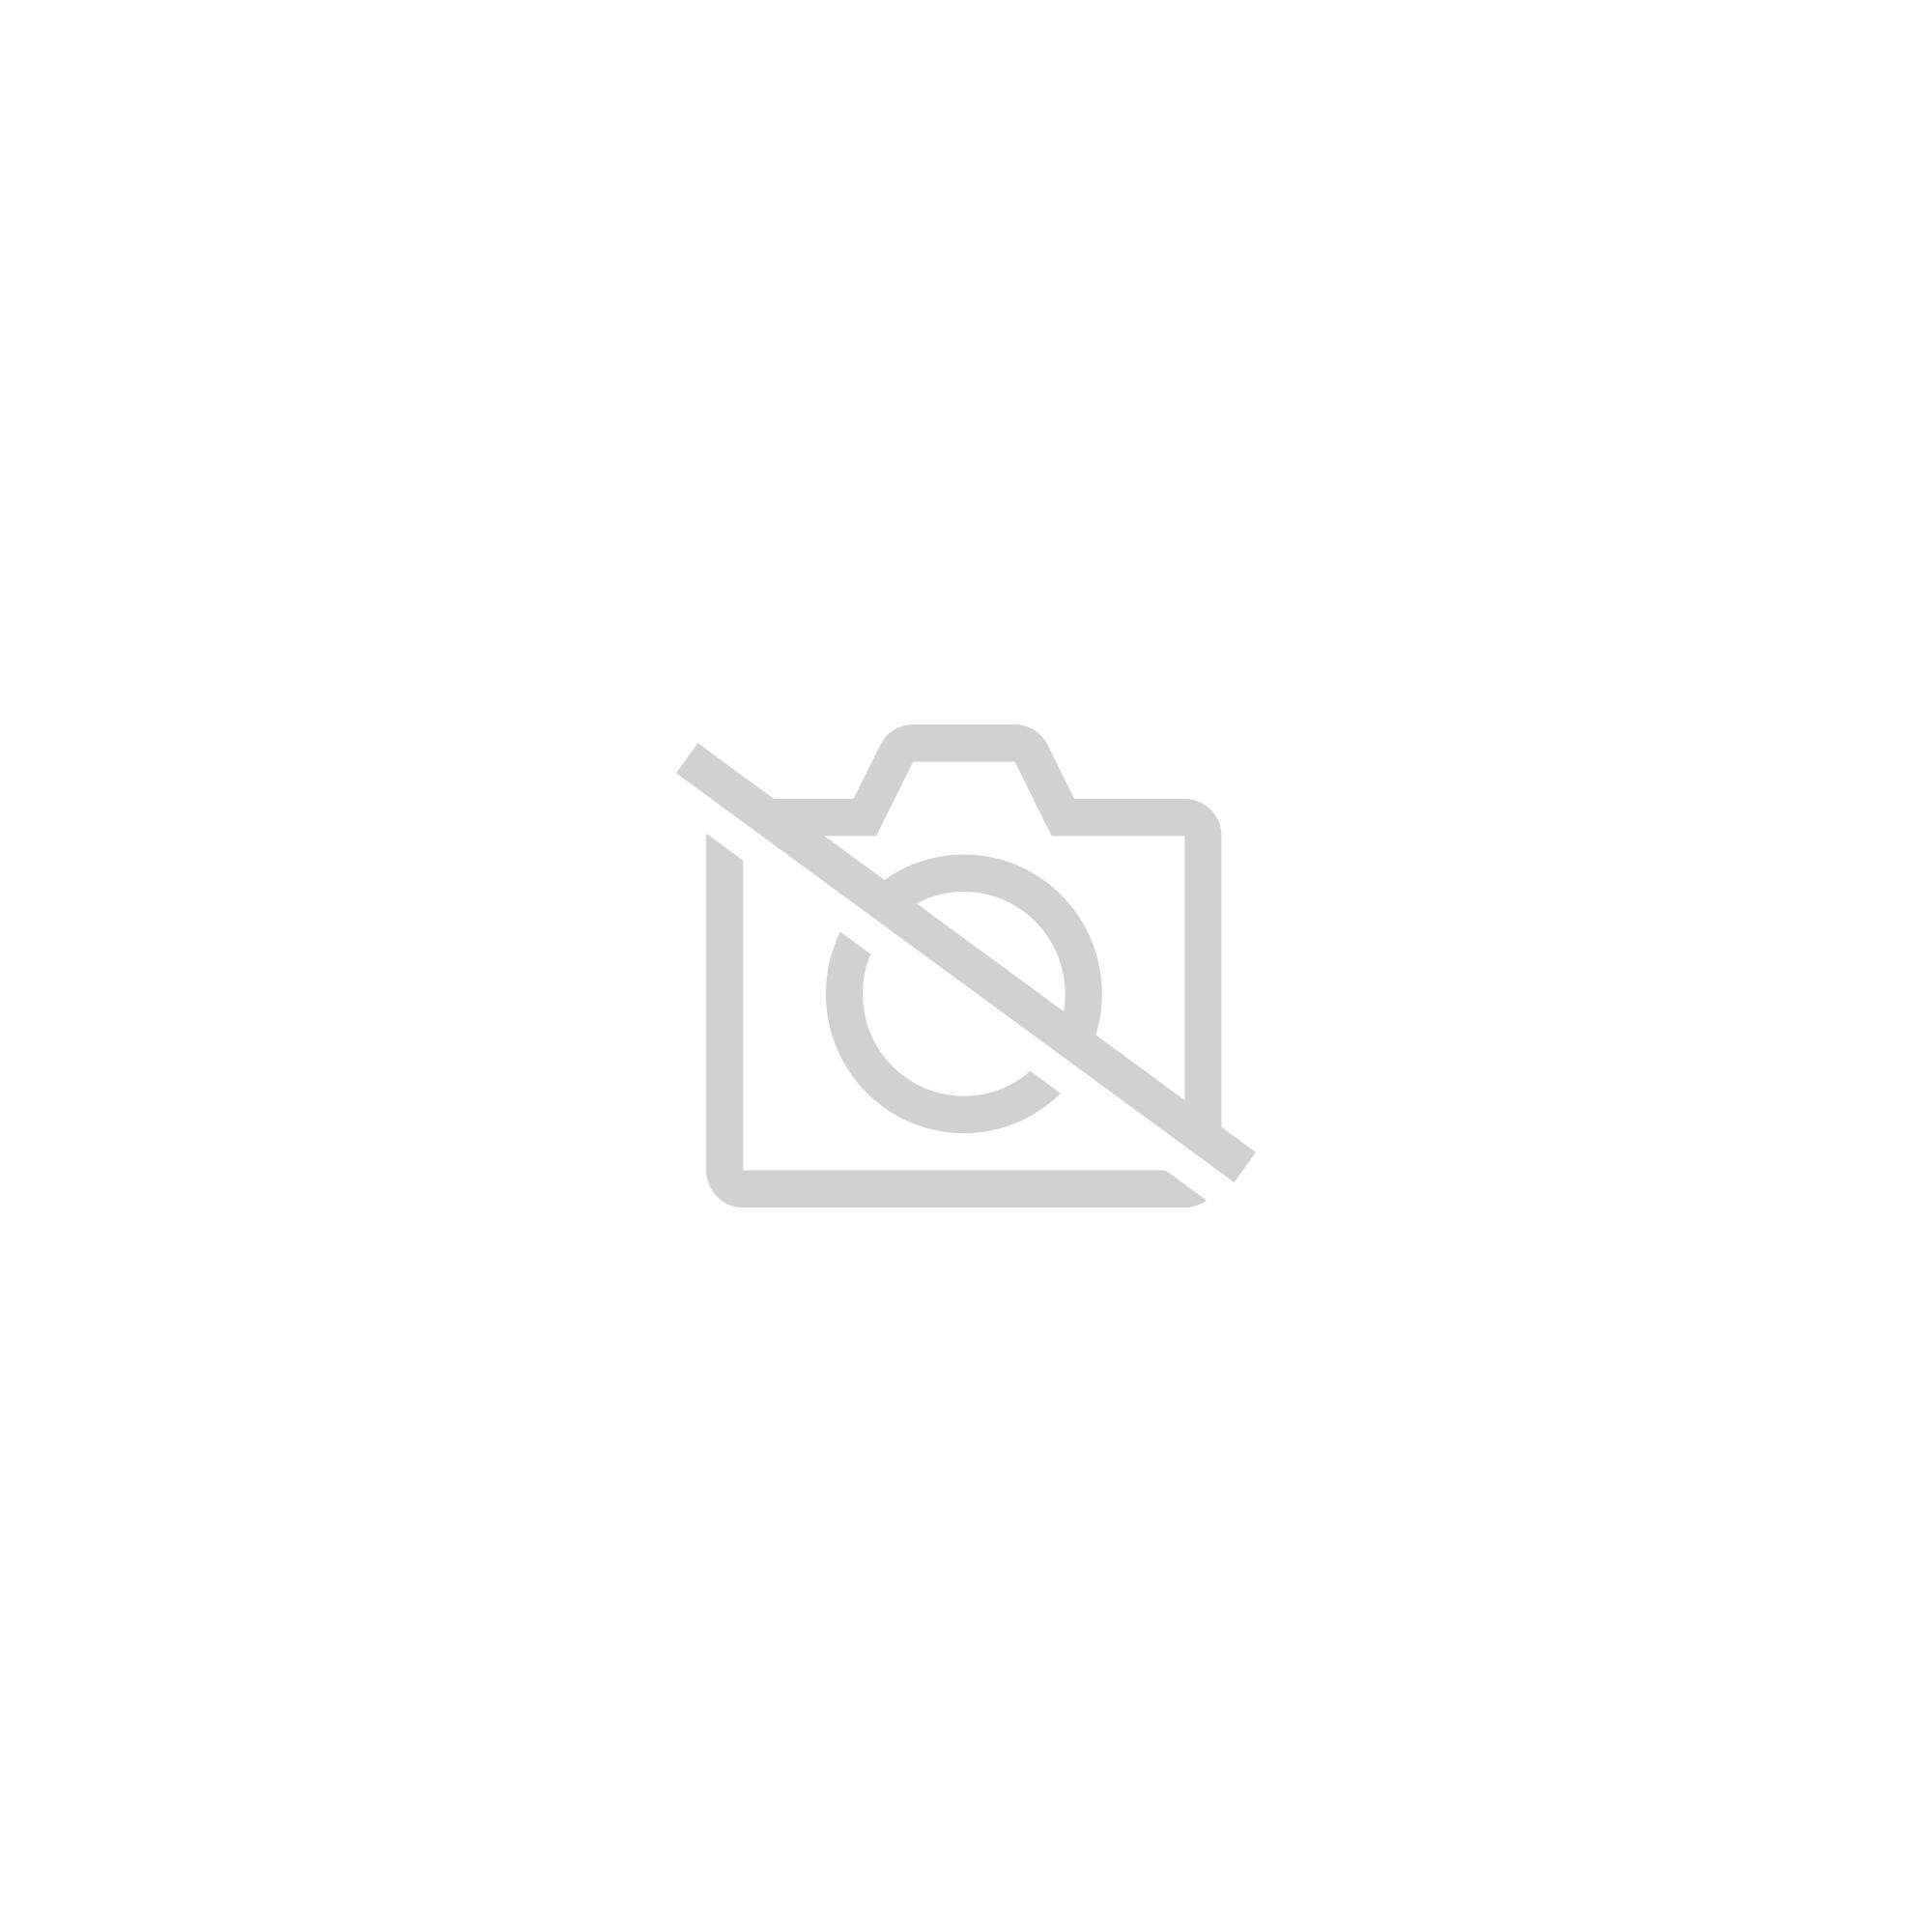 Pologne, Occupation Allemande 1941, Gouvernement General, 2 Valeurs Chancelier Hitler, Yvert 89 Et 92, Oblit�r�es, Tbe